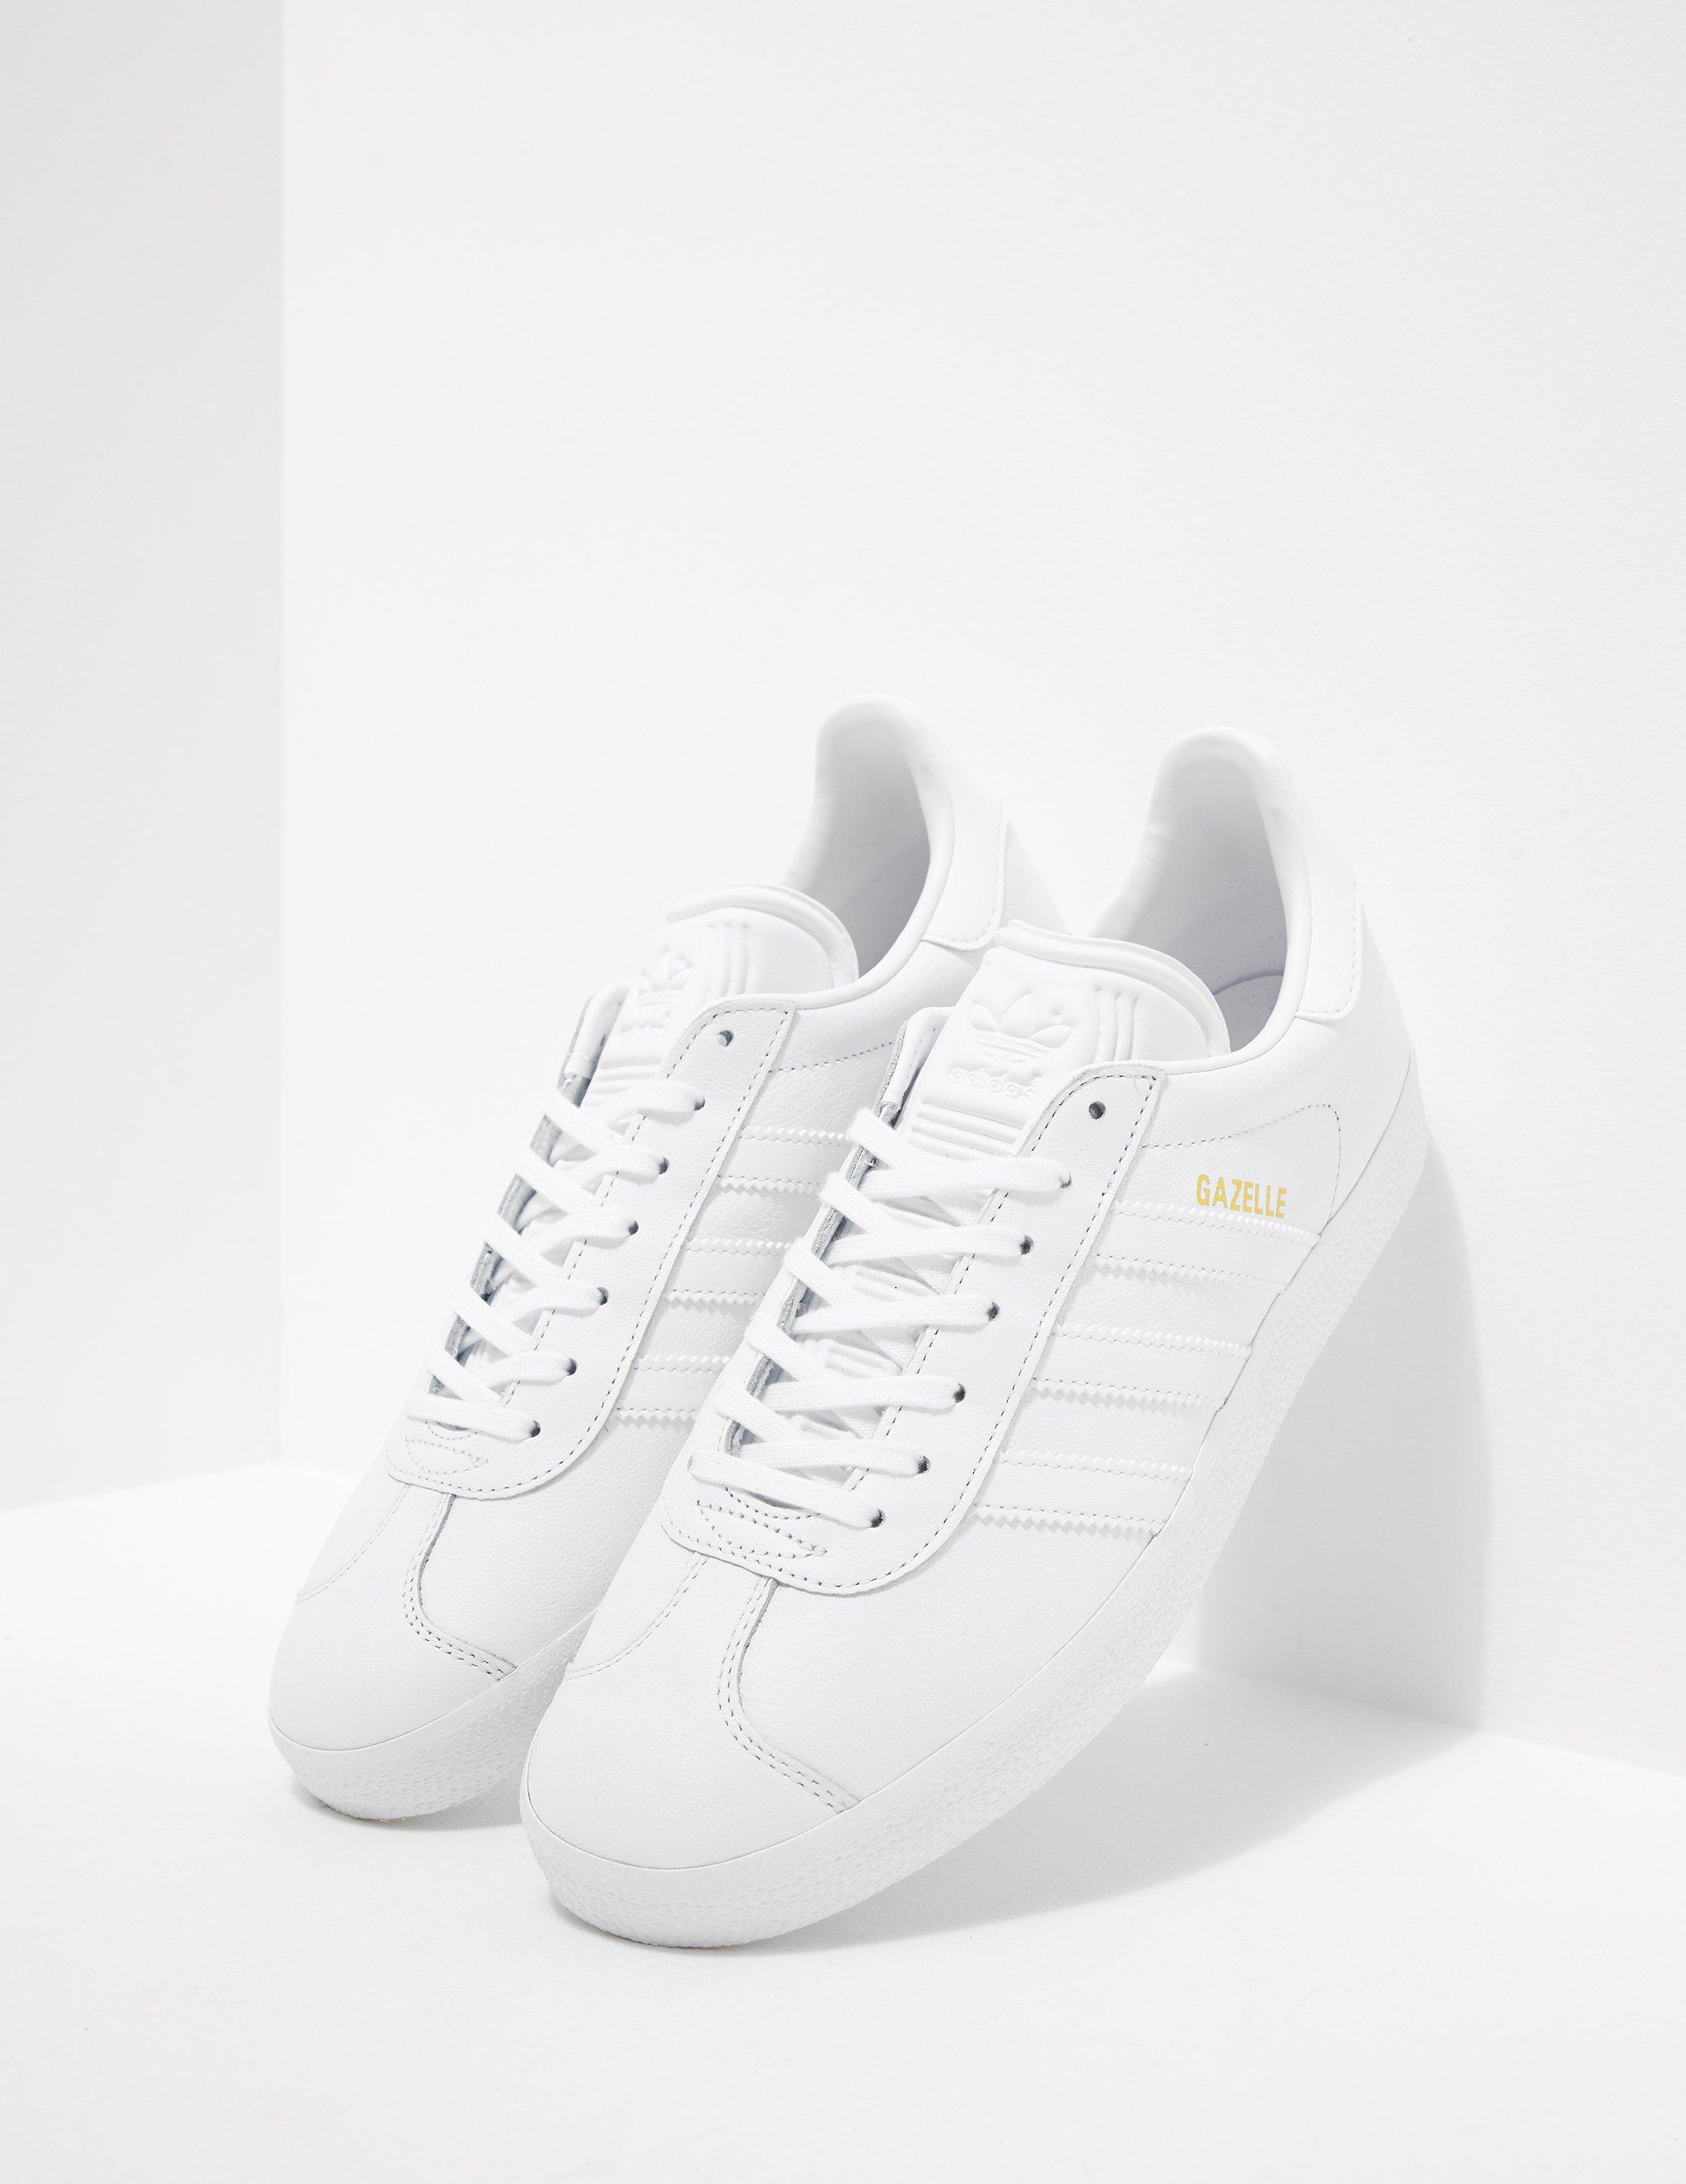 adidas Originals Leather Mens Gazelle